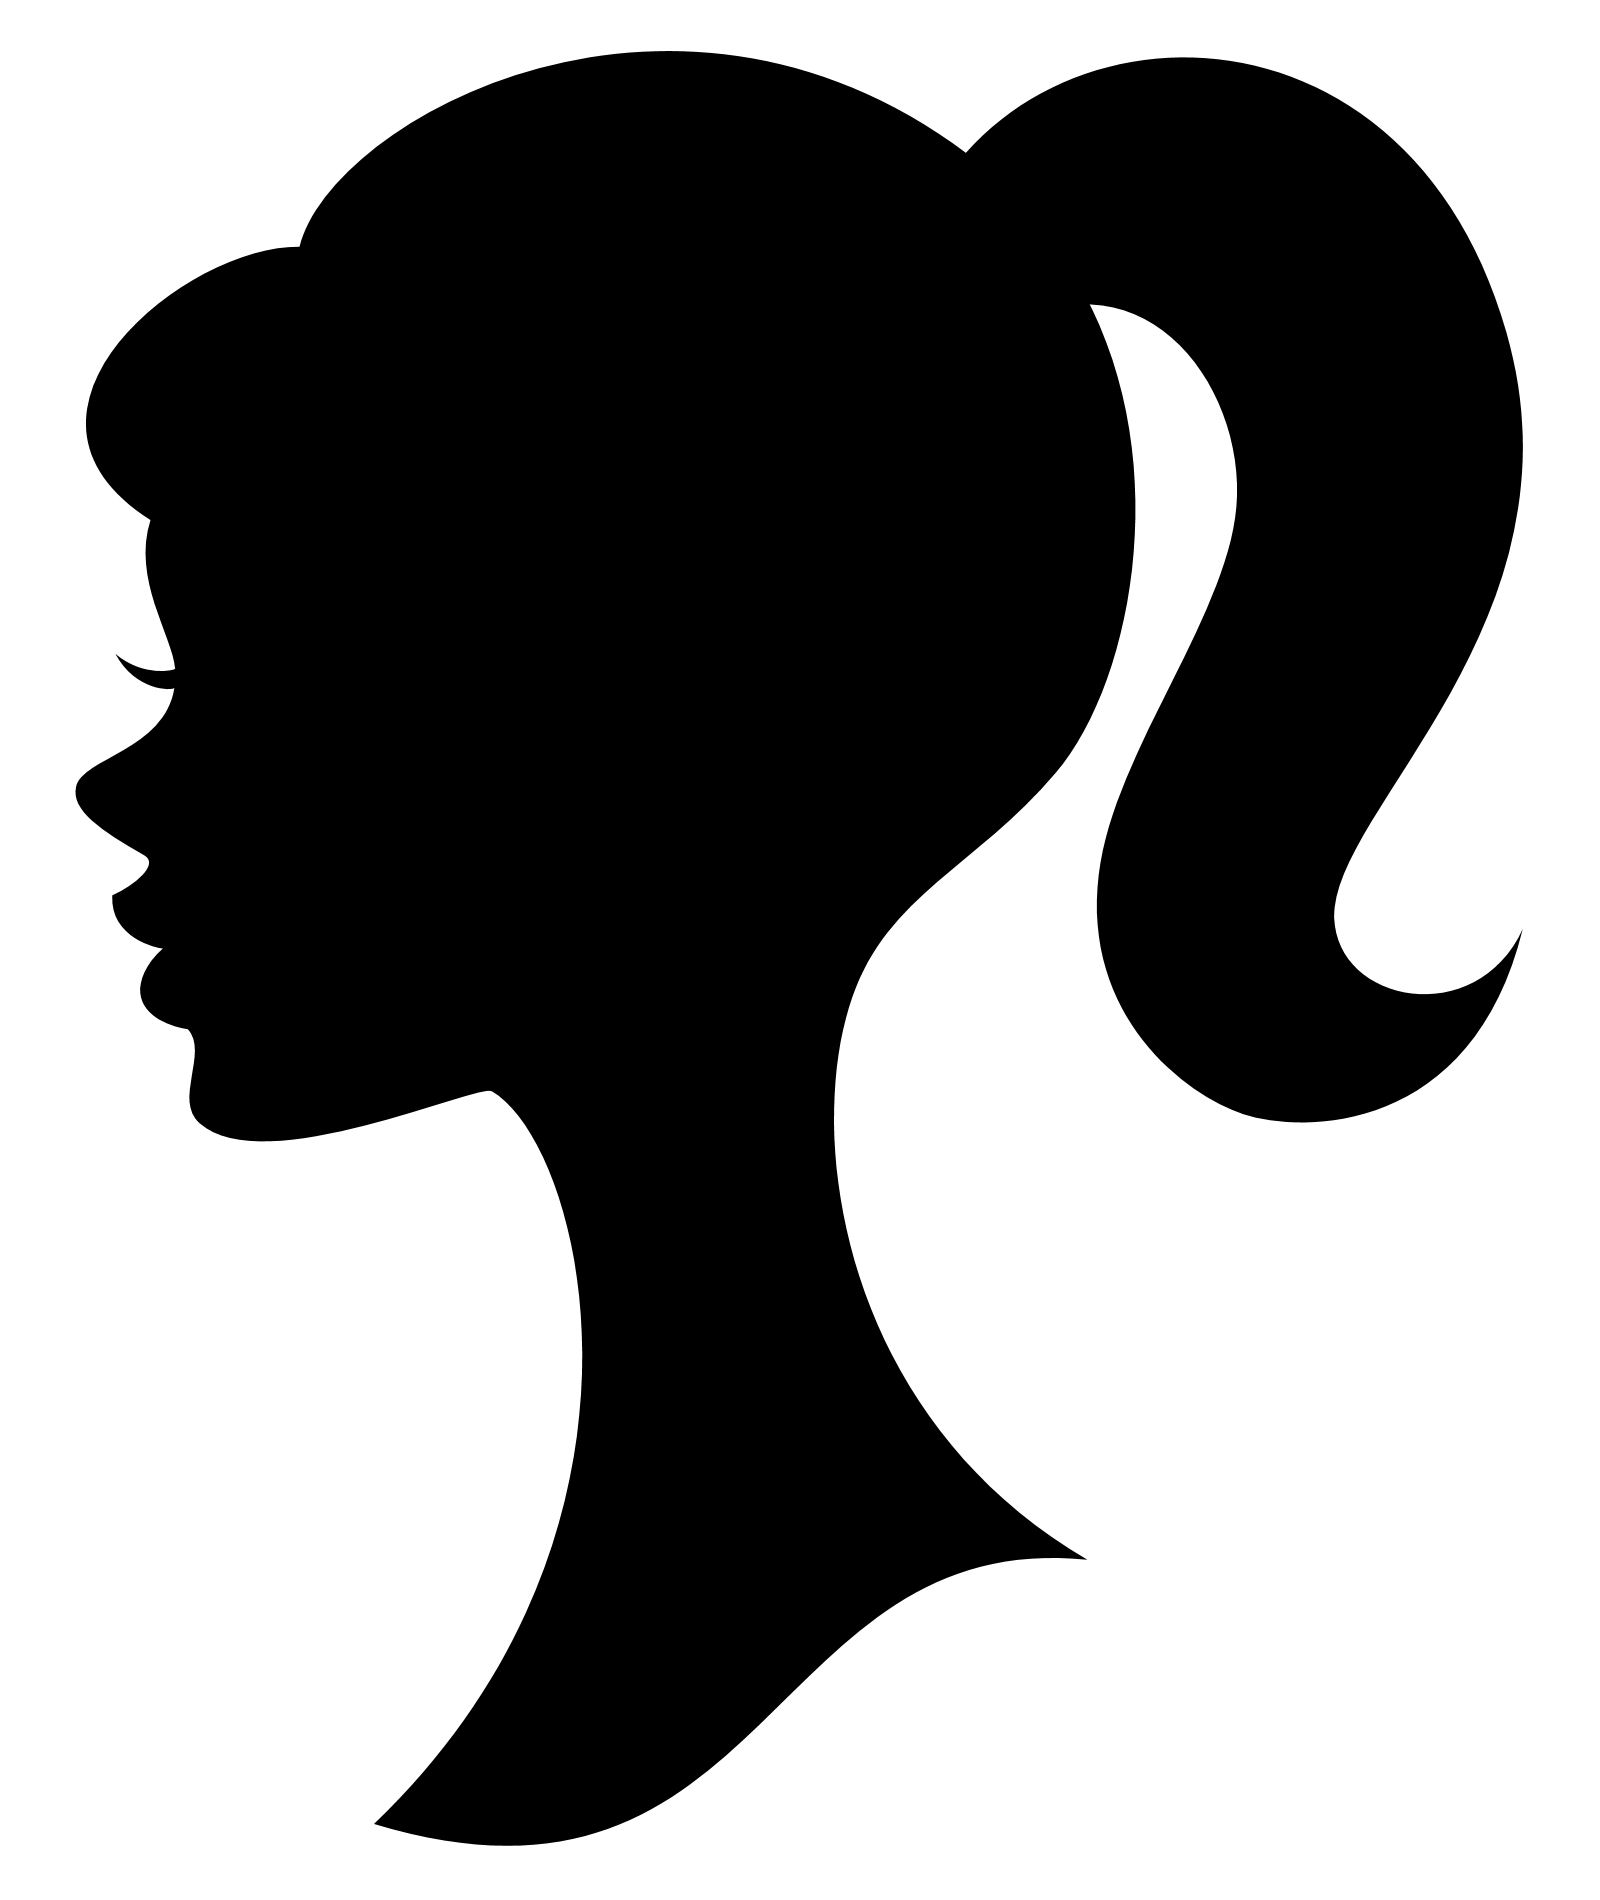 ... Barbie Silhouette Clipart ...-... Barbie Silhouette Clipart ...-12